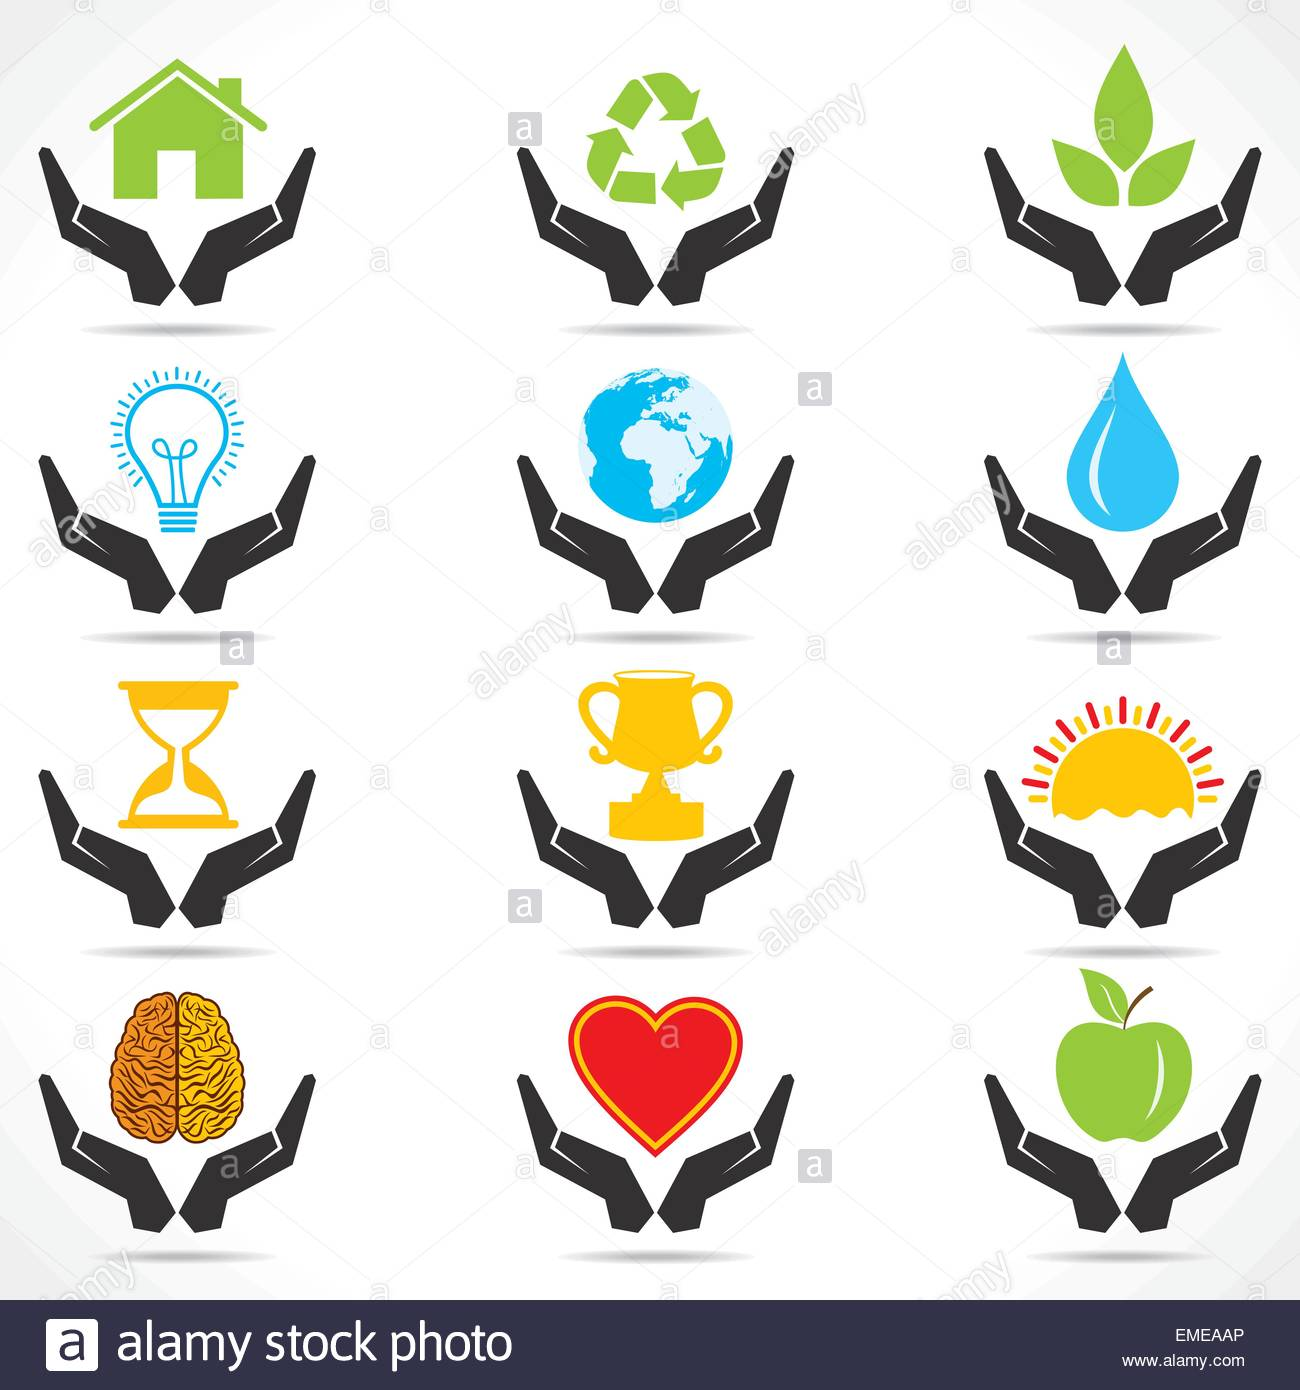 Icono de mano conceptual con diferentes iconos de objeto Imagen De Stock